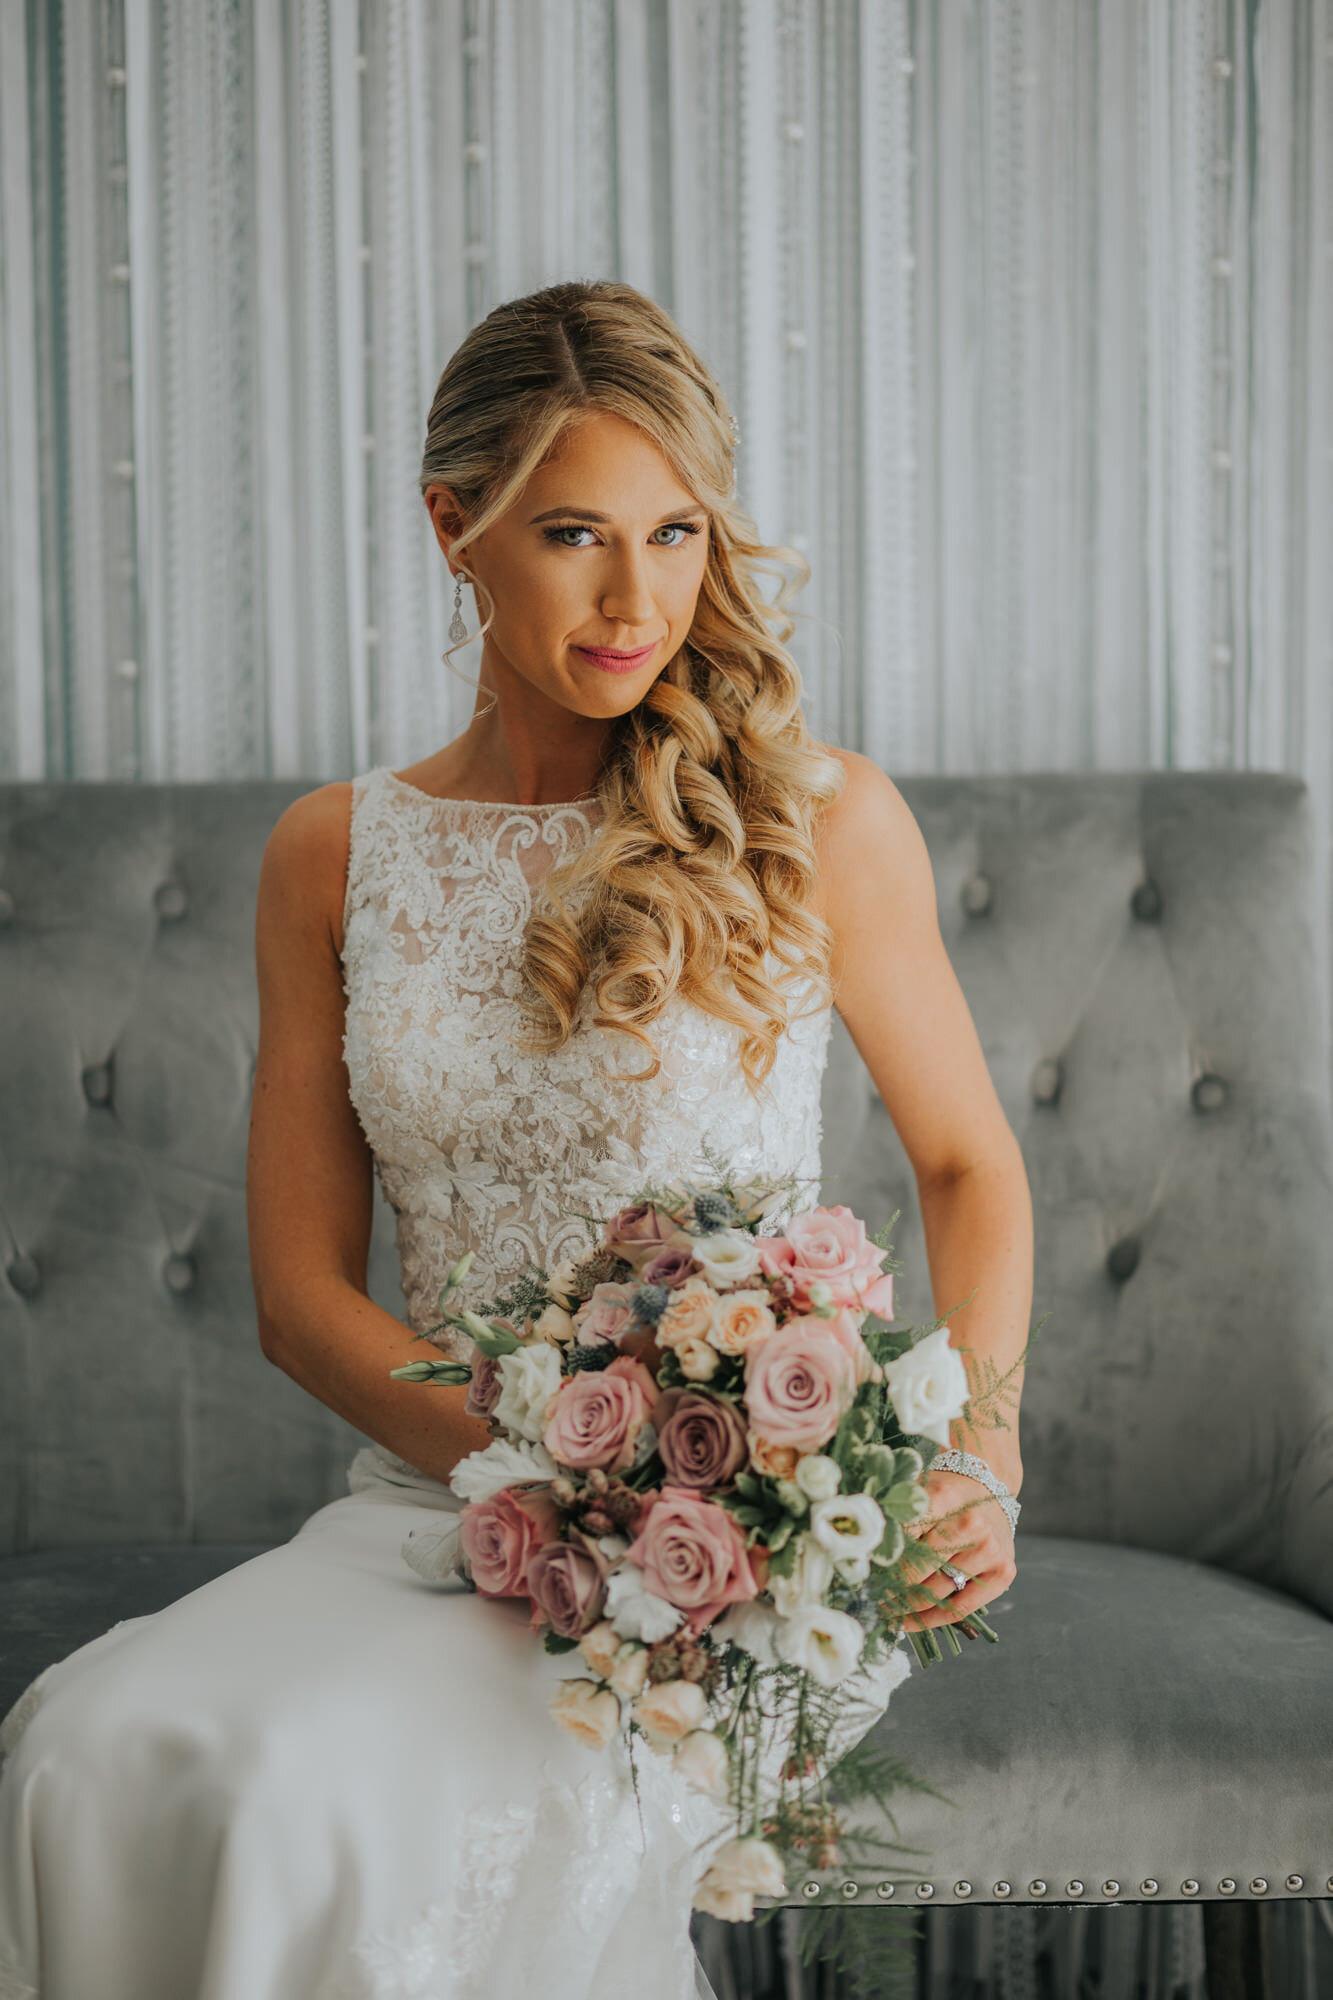 081Sean_Emily_Wedding_3-30-19.jpg